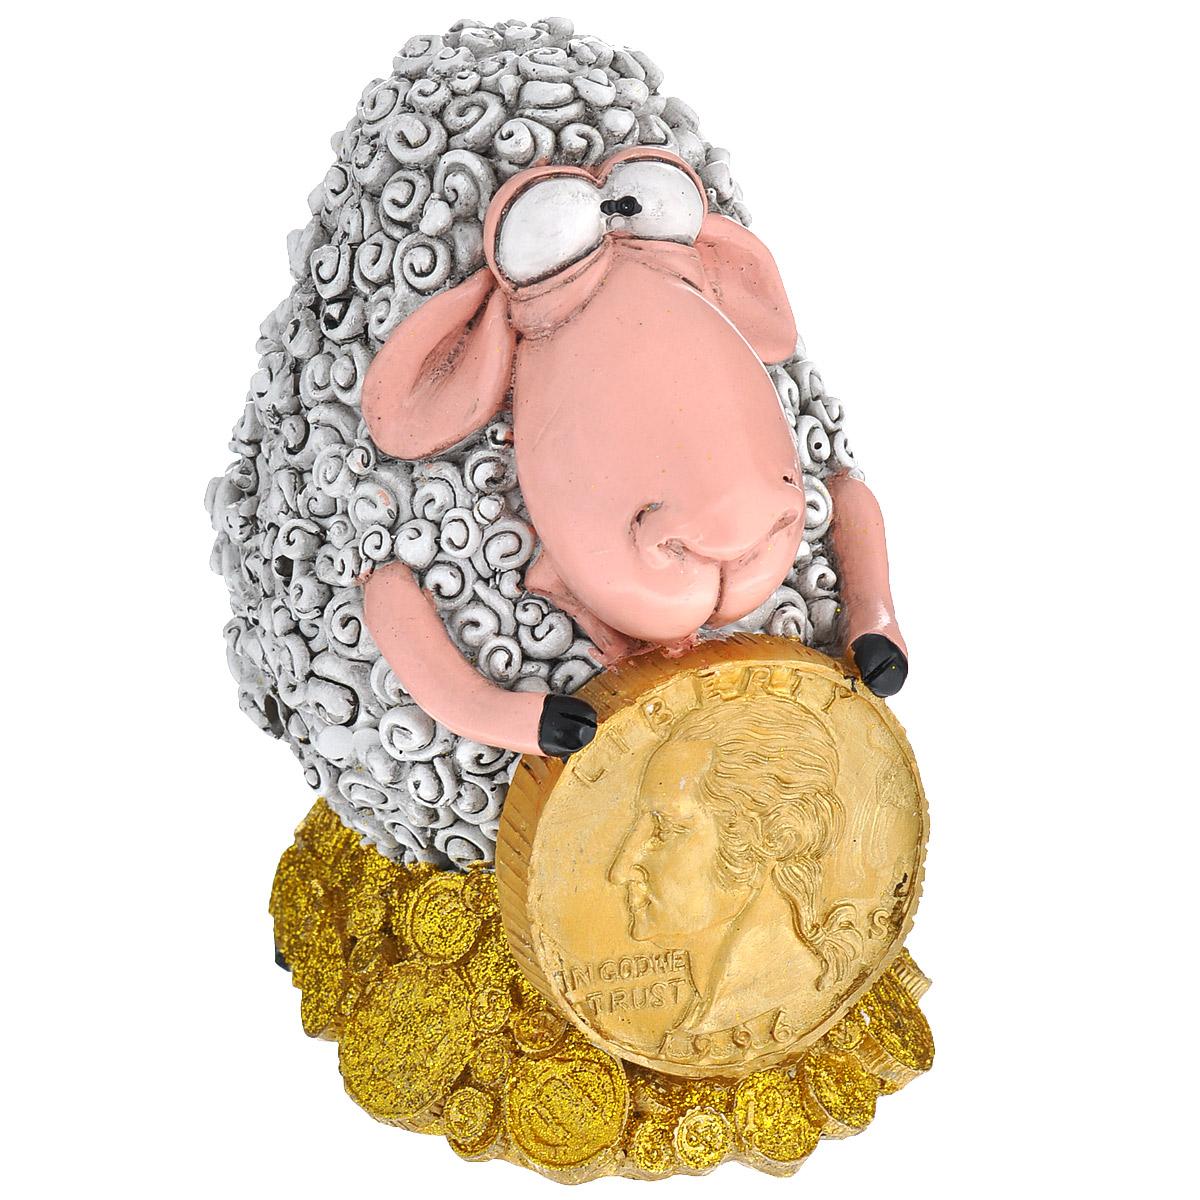 Копилка декоративная Comical World Овечка с монетой, цвет: серый, золотистыйCW-WD83715-AL